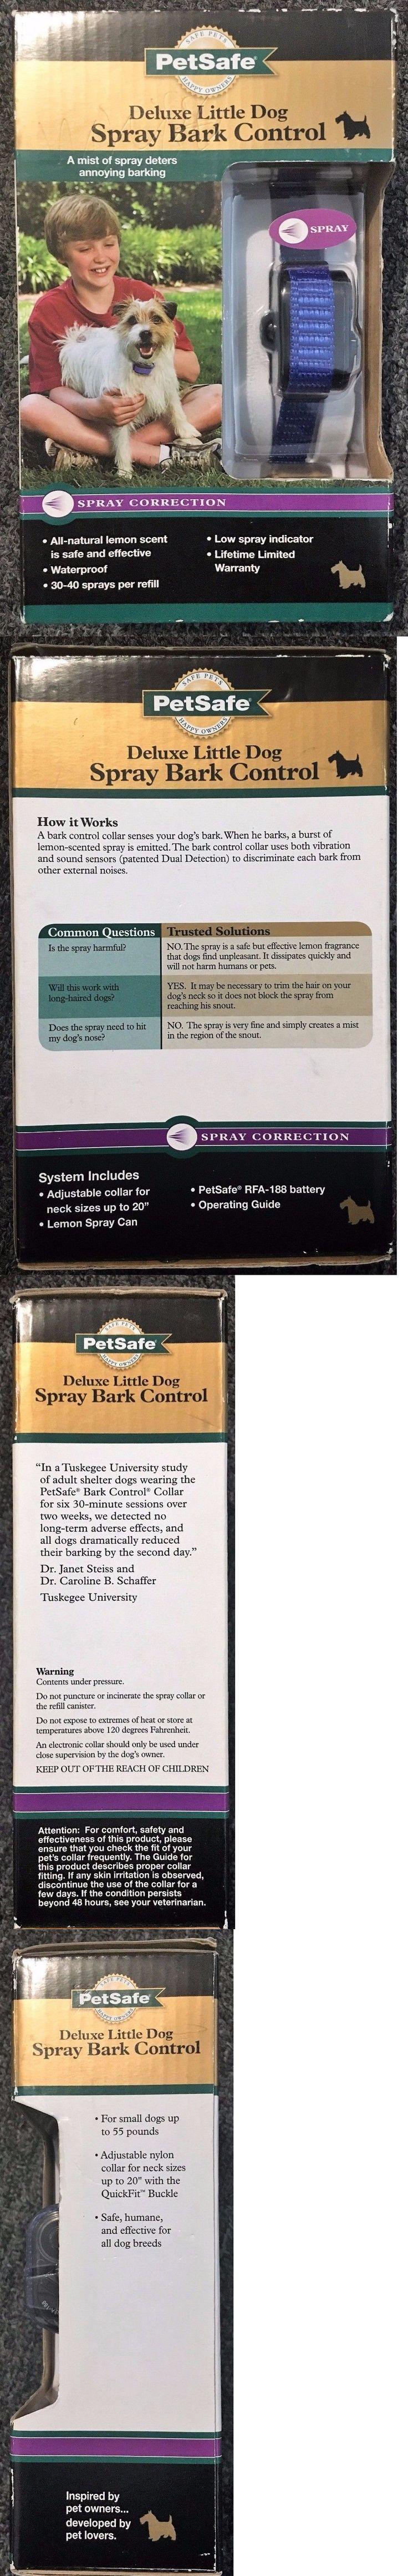 Bark Collars 66774: Petsafe Deluxe Little Dog Spray Bark Control -> BUY IT NOW ONLY: $42.9 on eBay!